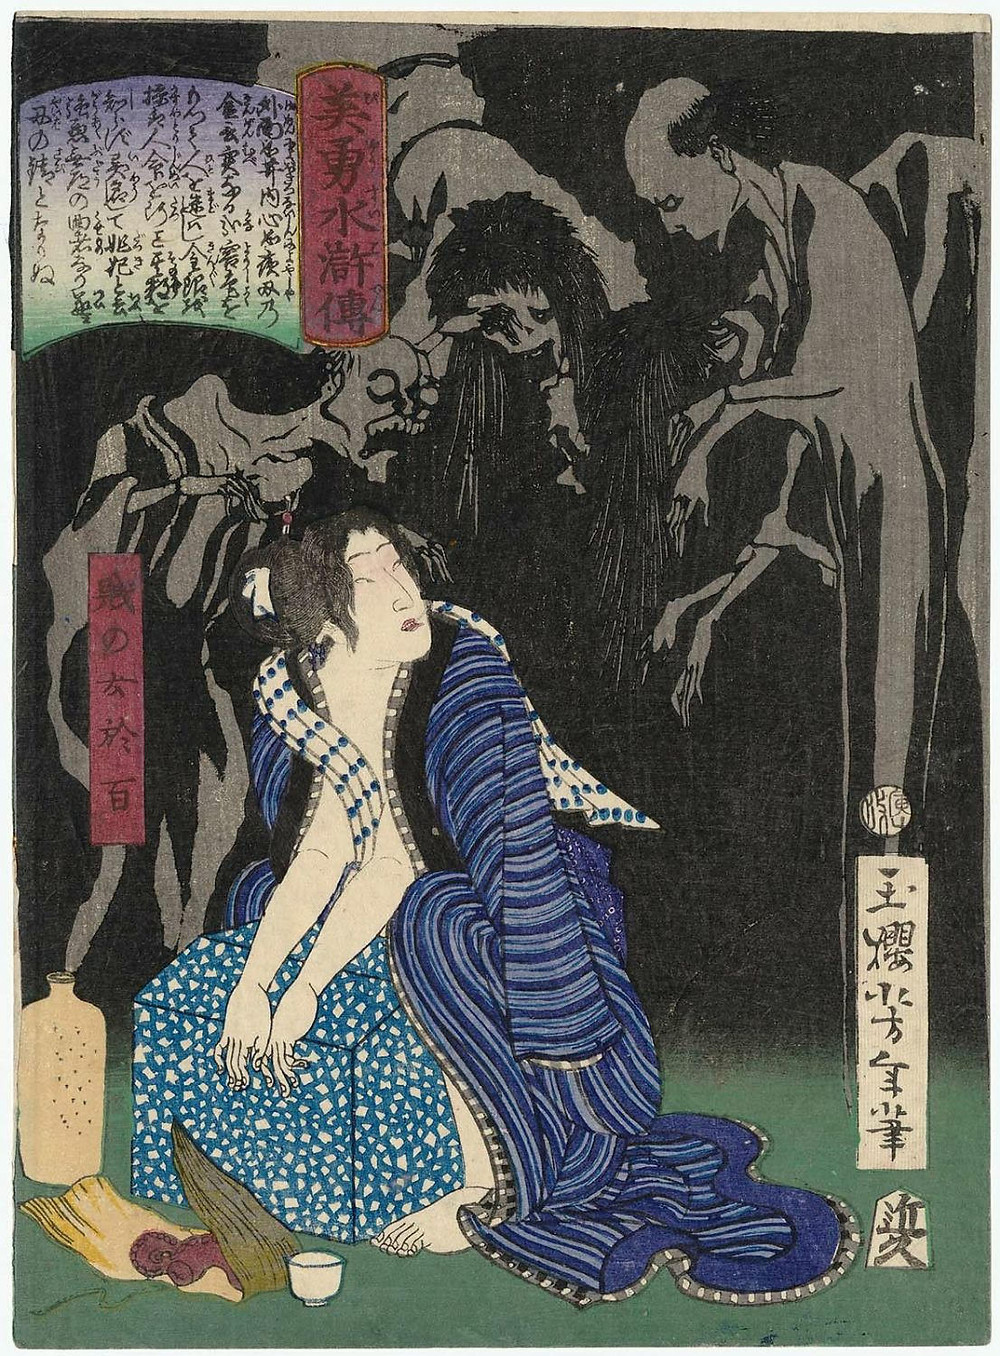 "Tshukioka Yoshitoshi, Shizunome Ohya, extrait des series ""Les sagas de la beauté et de la bravoure ""  (Biyû Suikoden), 1866."